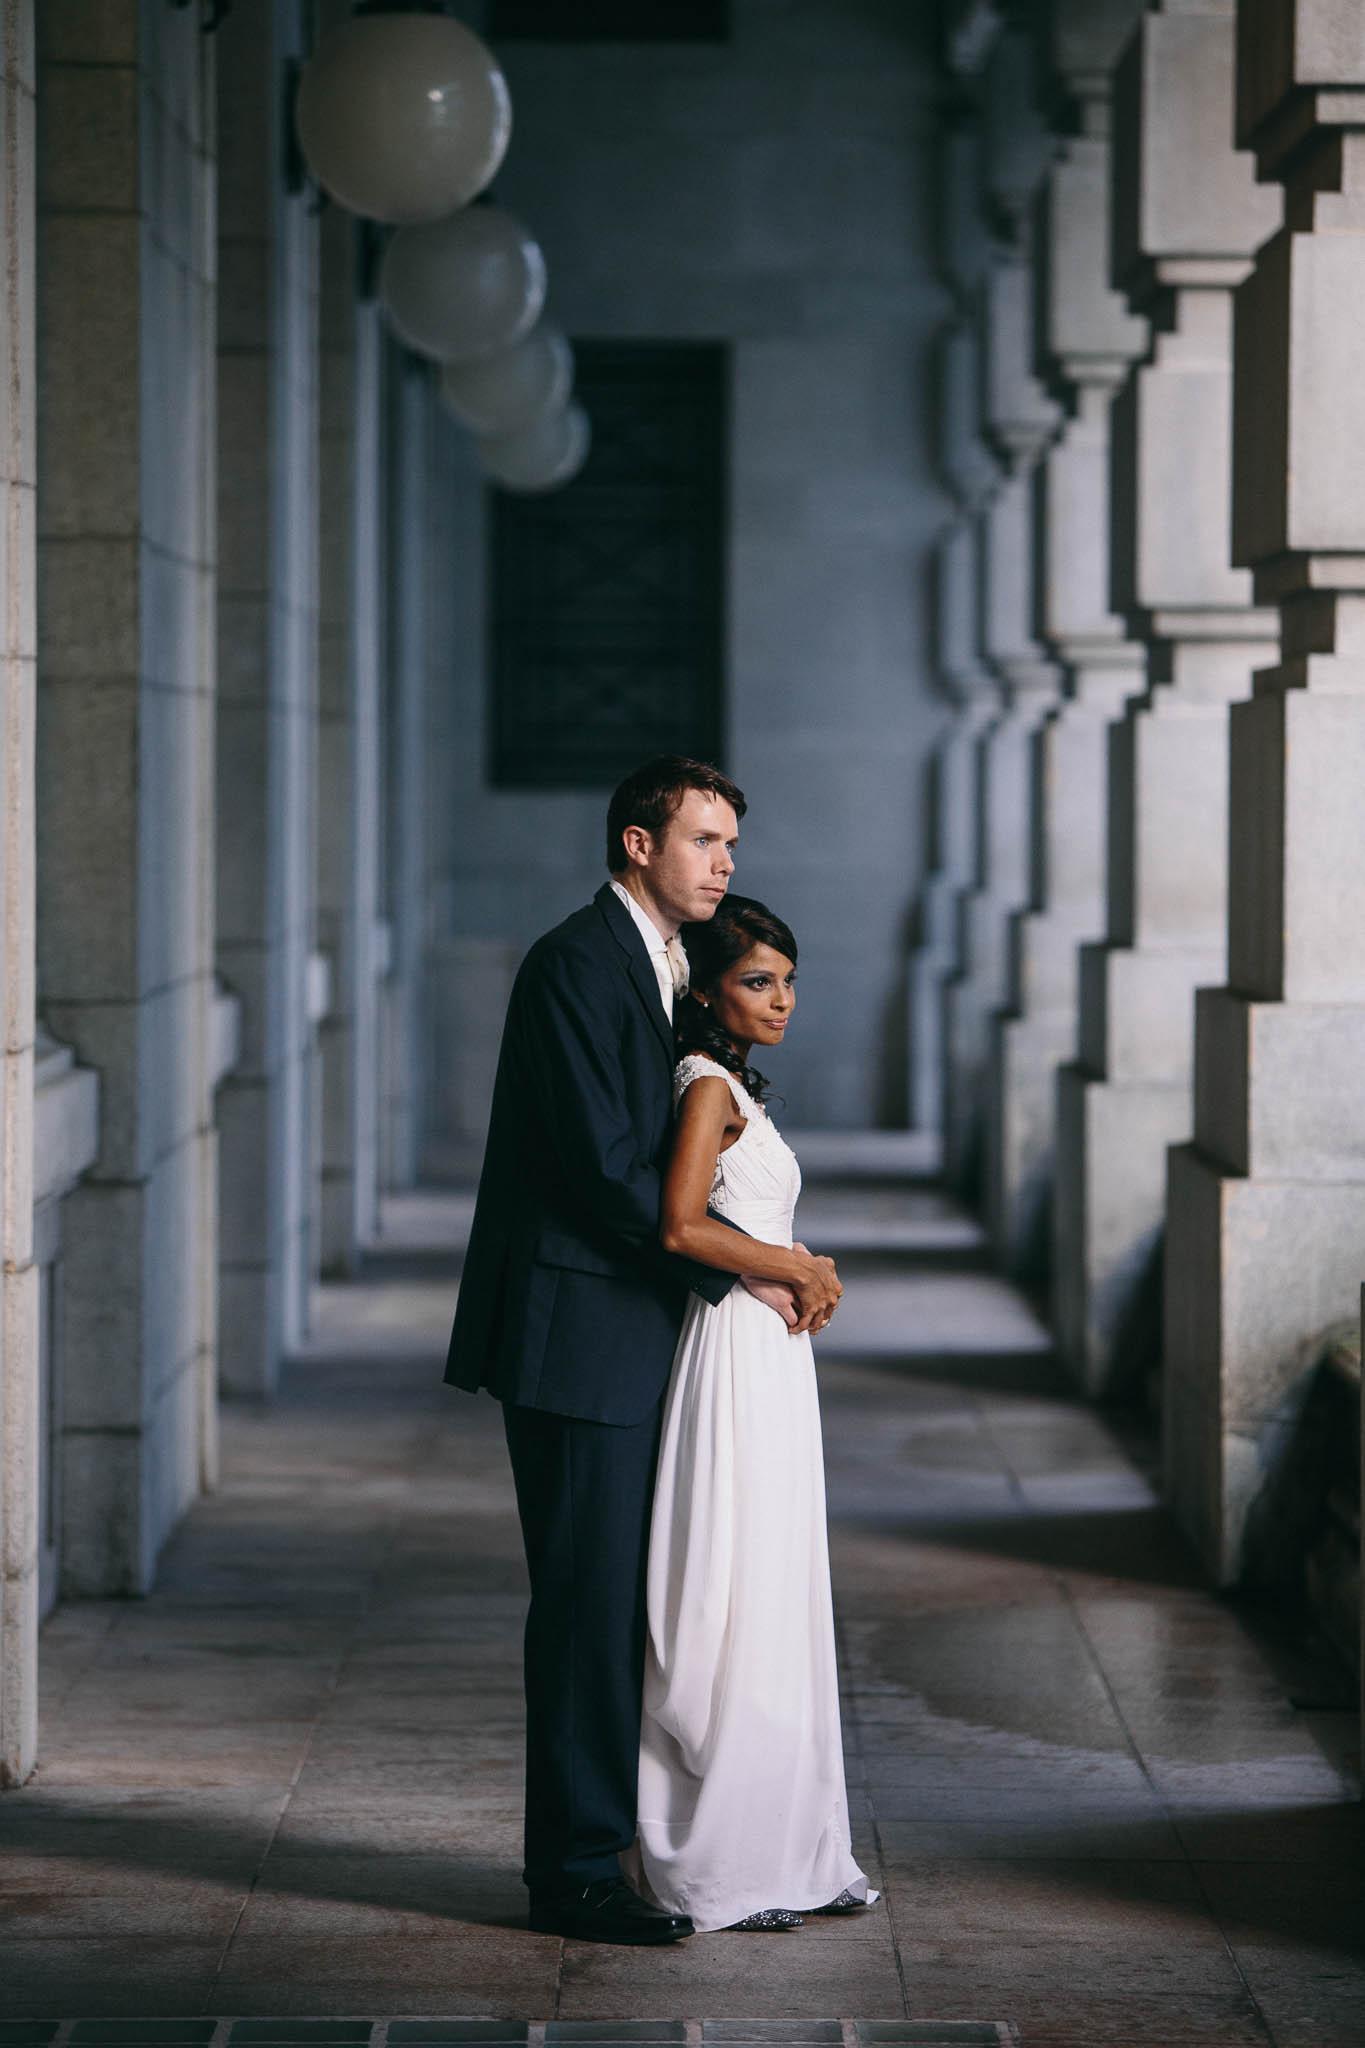 singapore-wedding-photographer-st-andrews-cathedral-renita-david-52.jpg